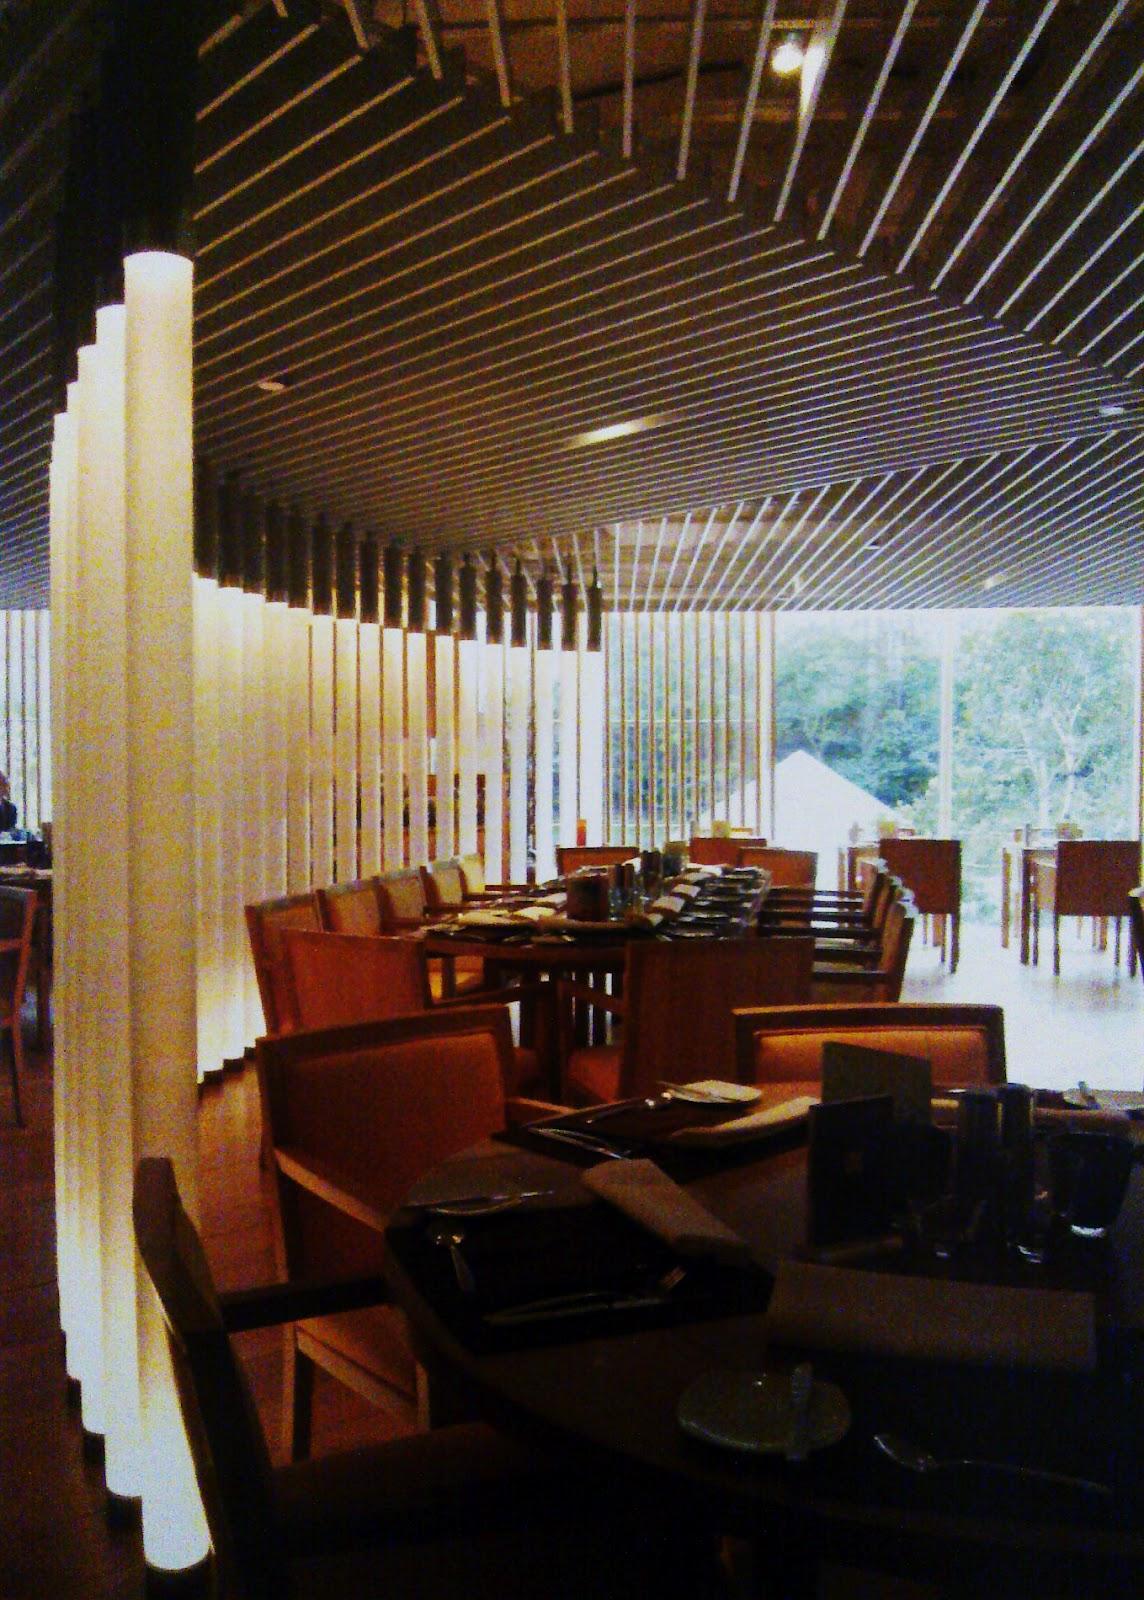 Pandyinteriordesigner bars restaurant interior design